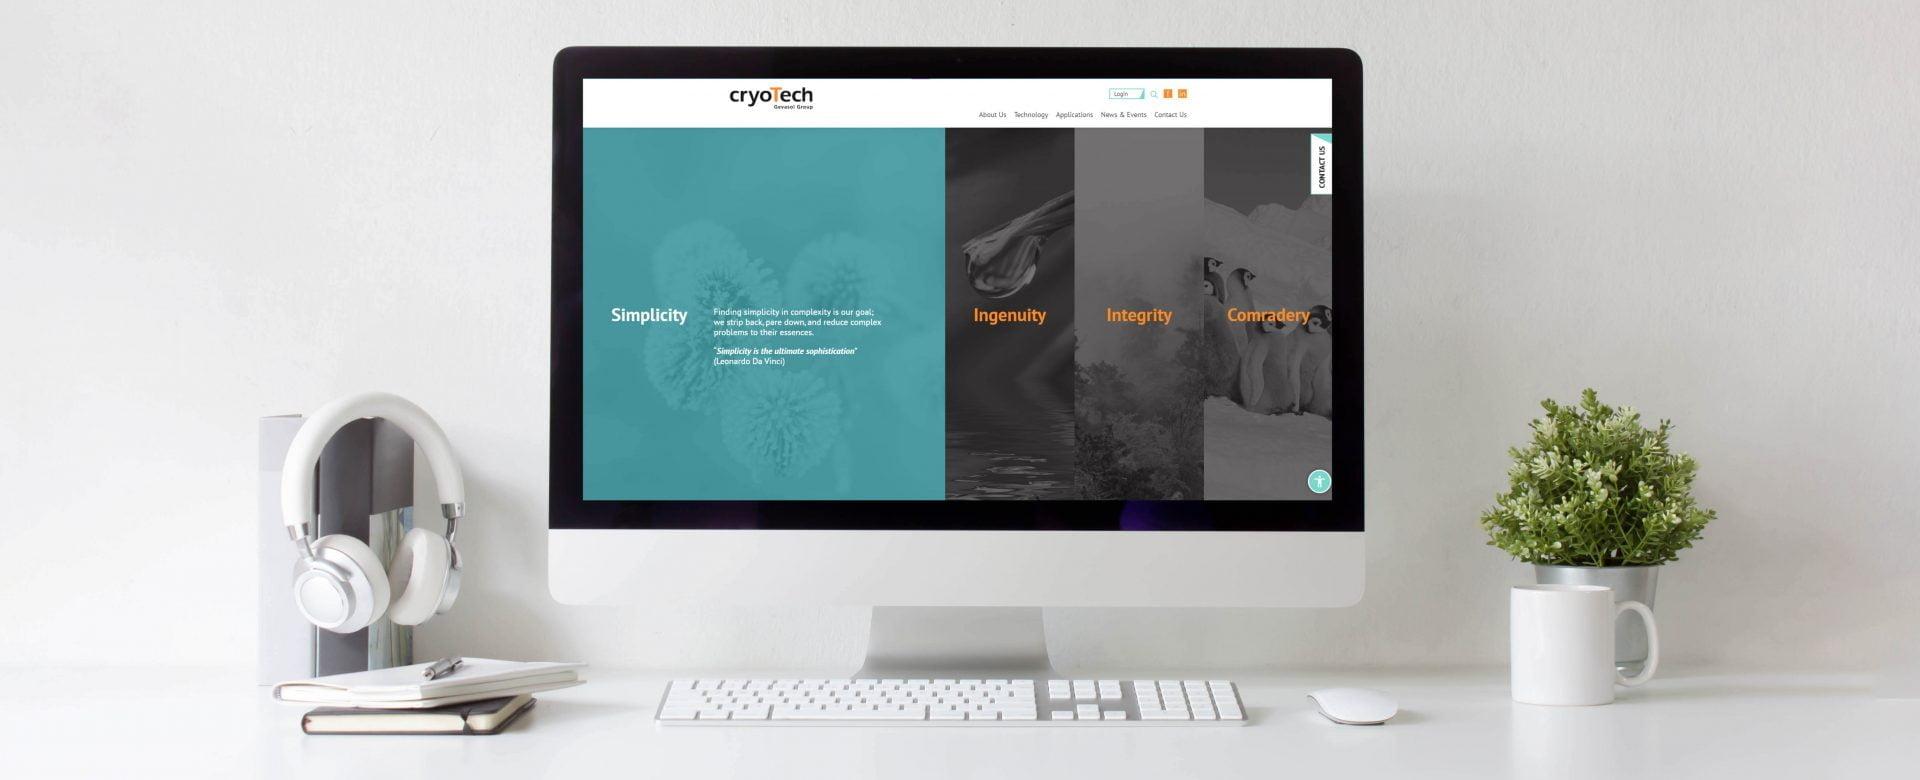 cryoTech 7